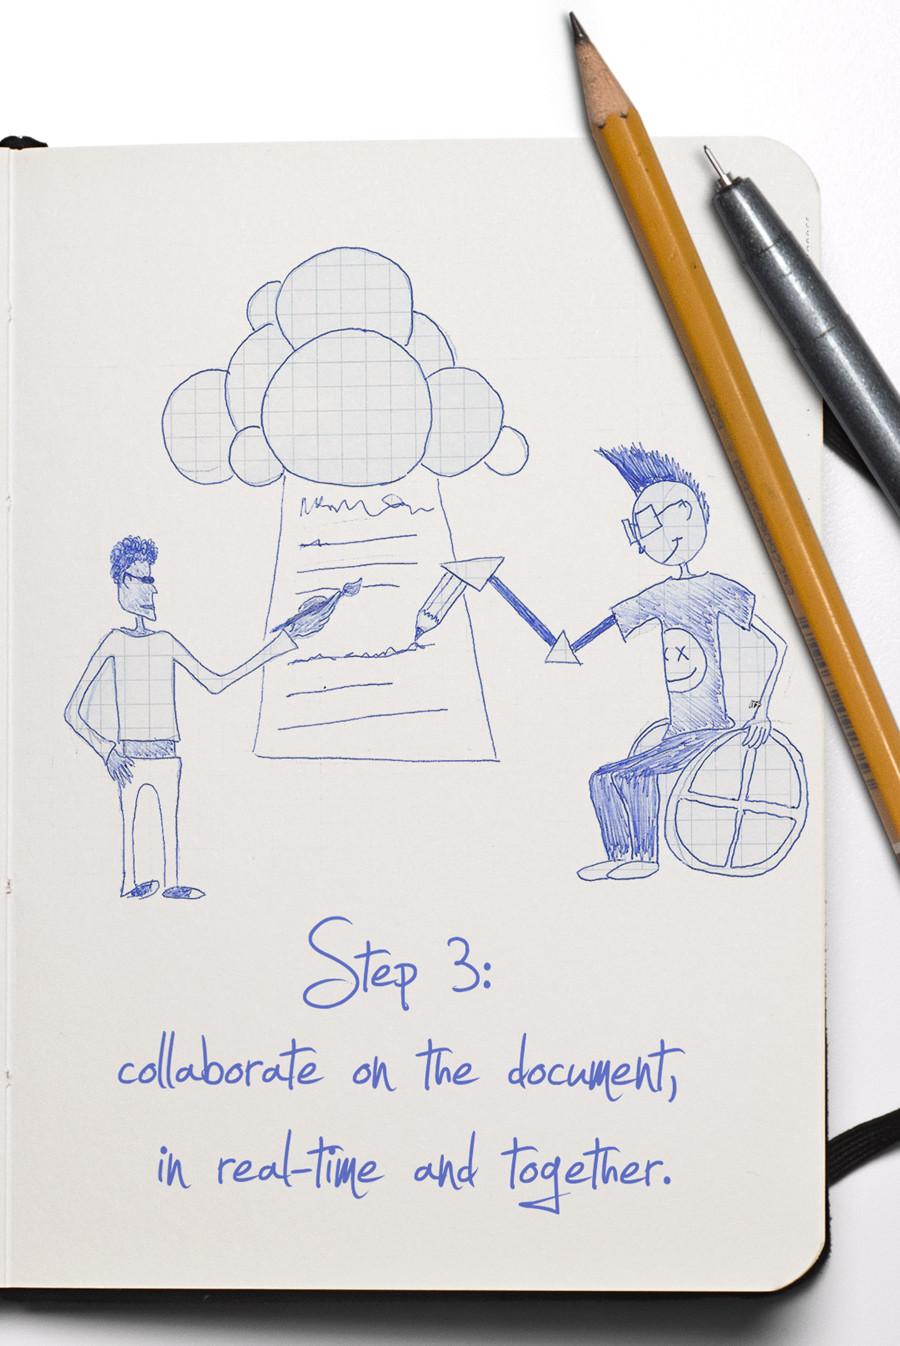 ownCloud Collabora collaborative editing